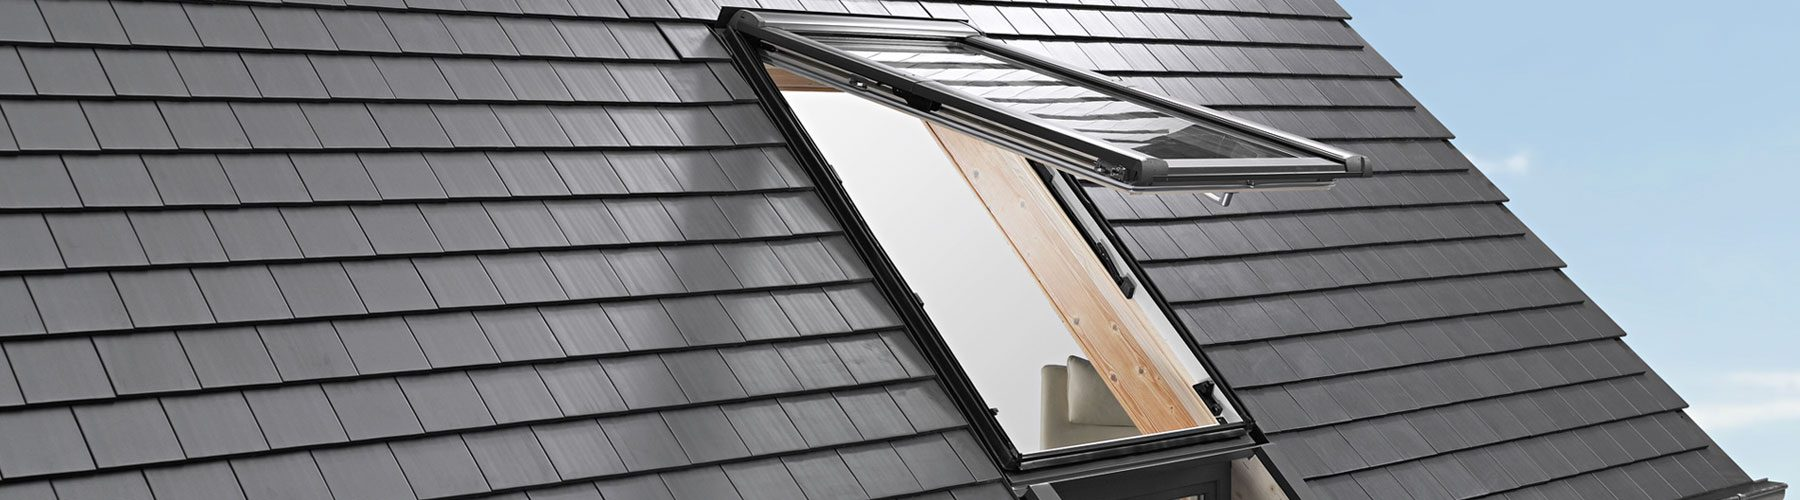 Fenêtre de toit en slide